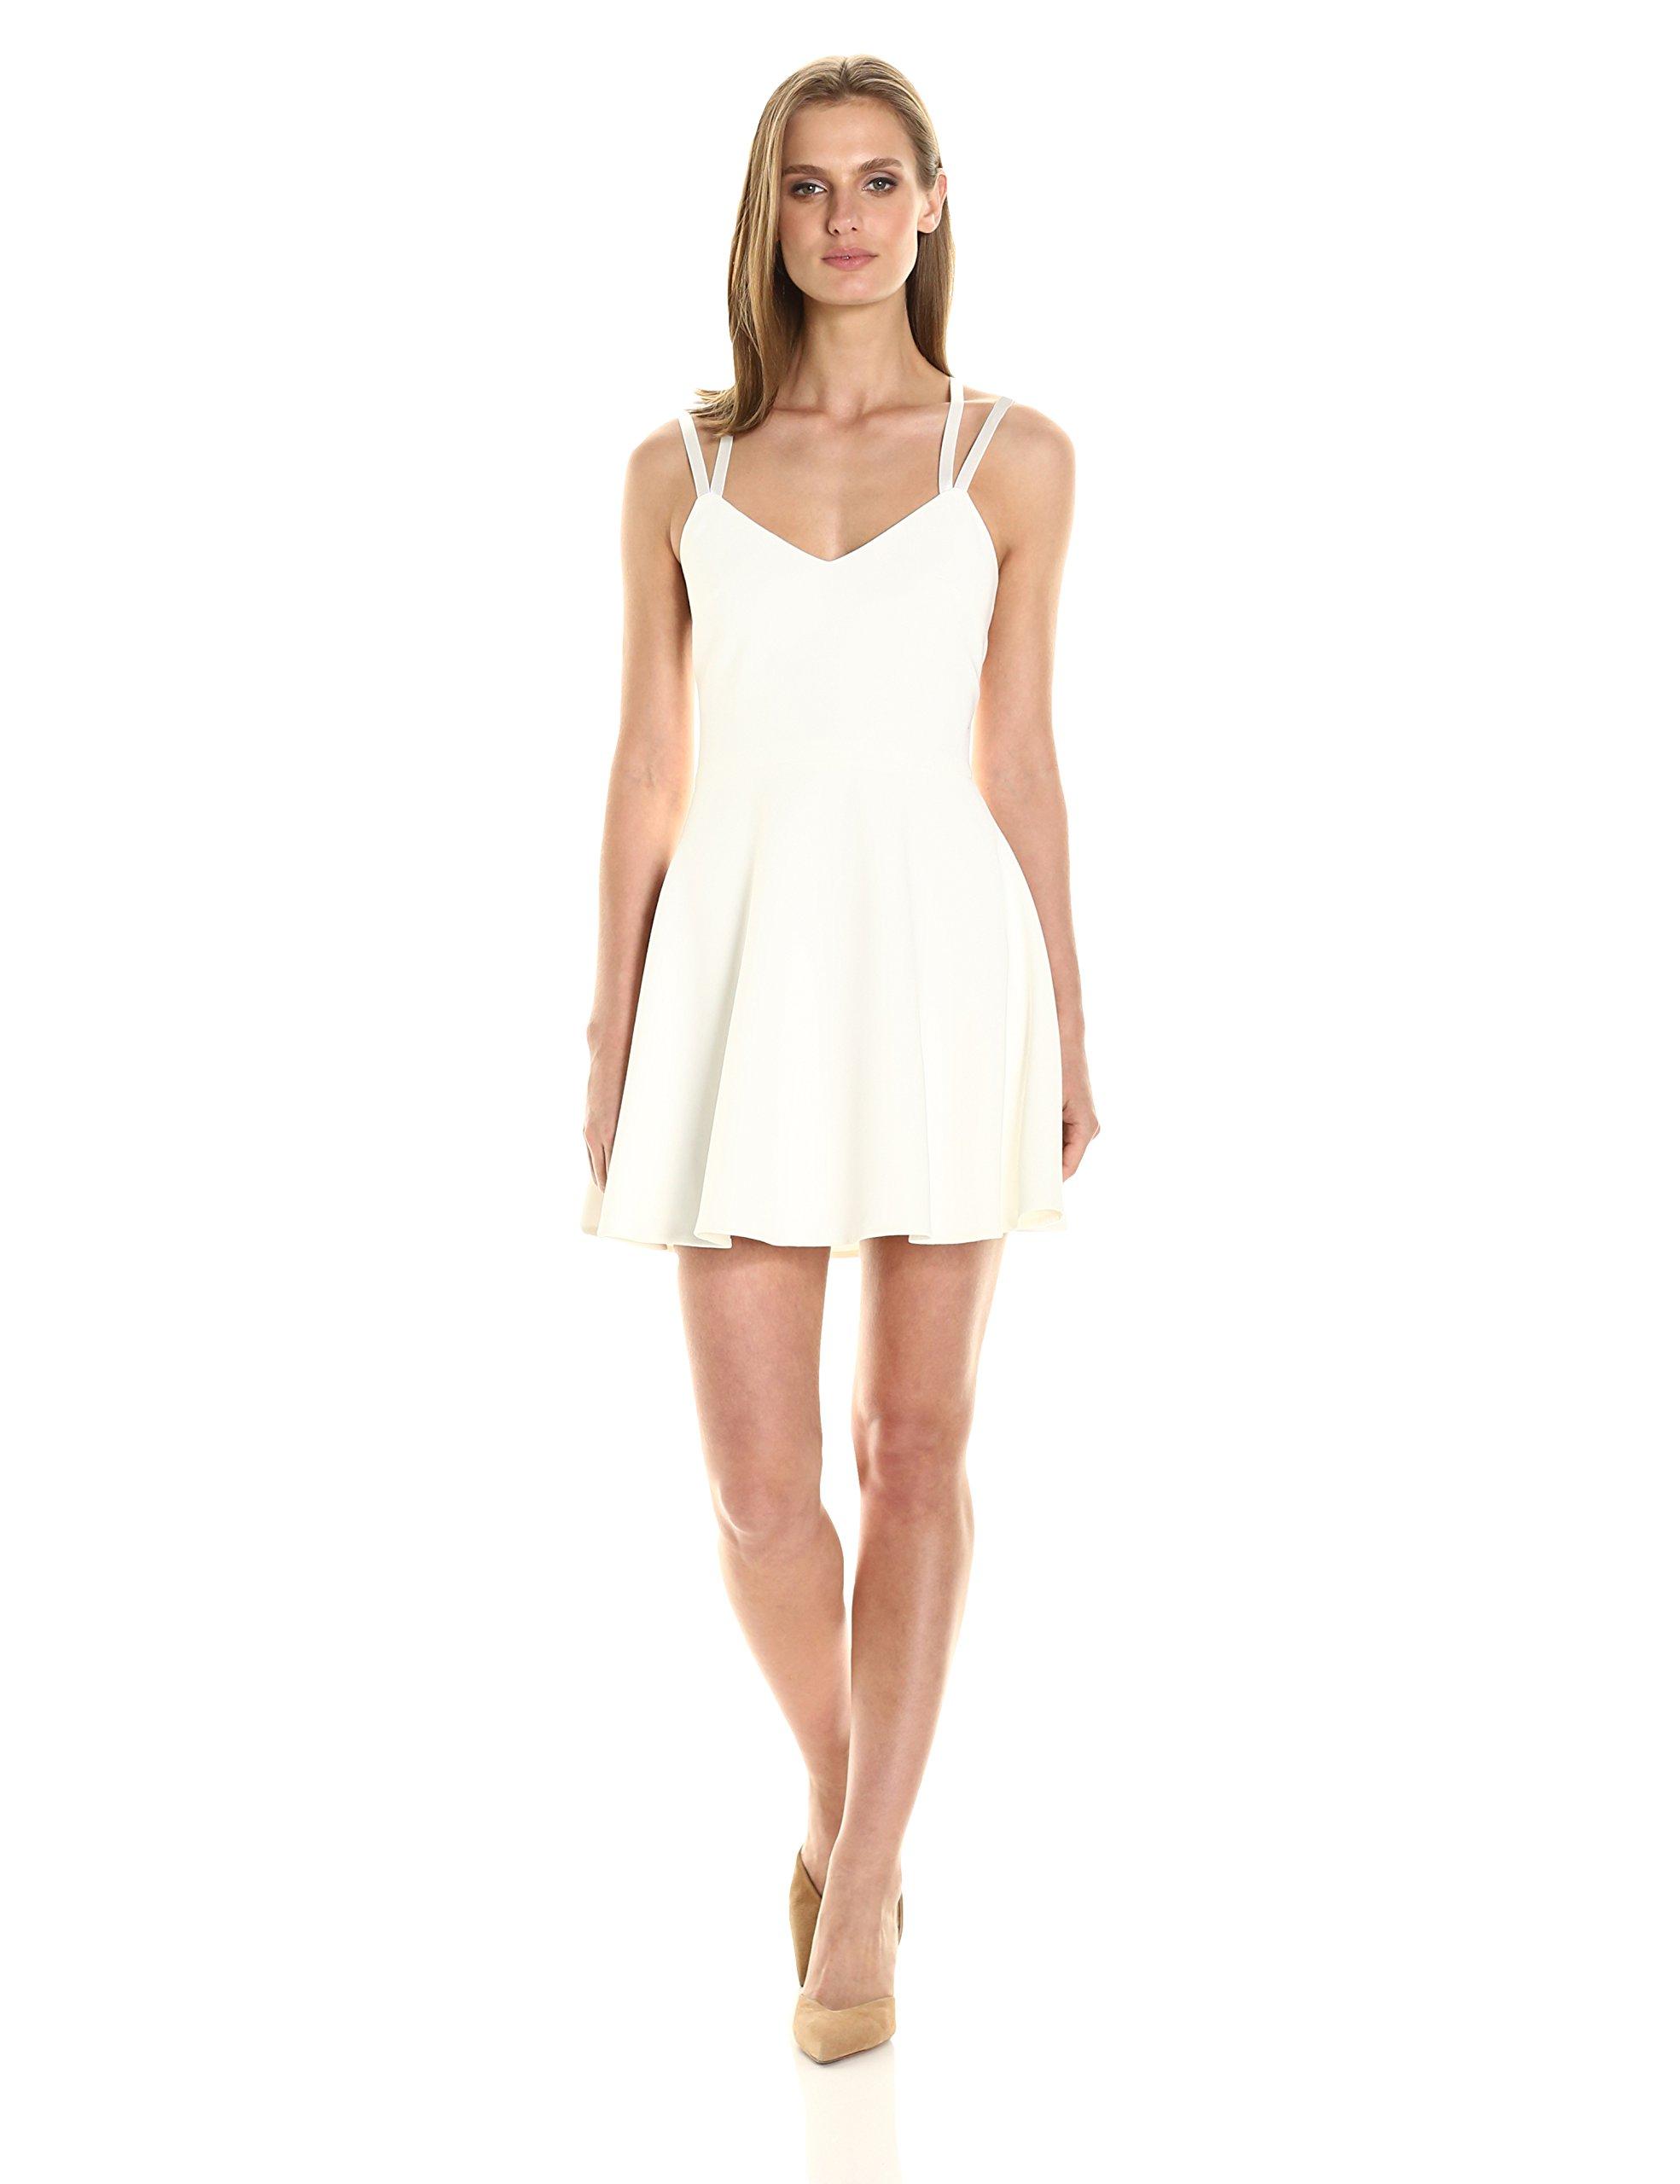 French Connection Women's Whisper Light Sleeveless Strappy Stretch Mini Dress, Summer White, 6